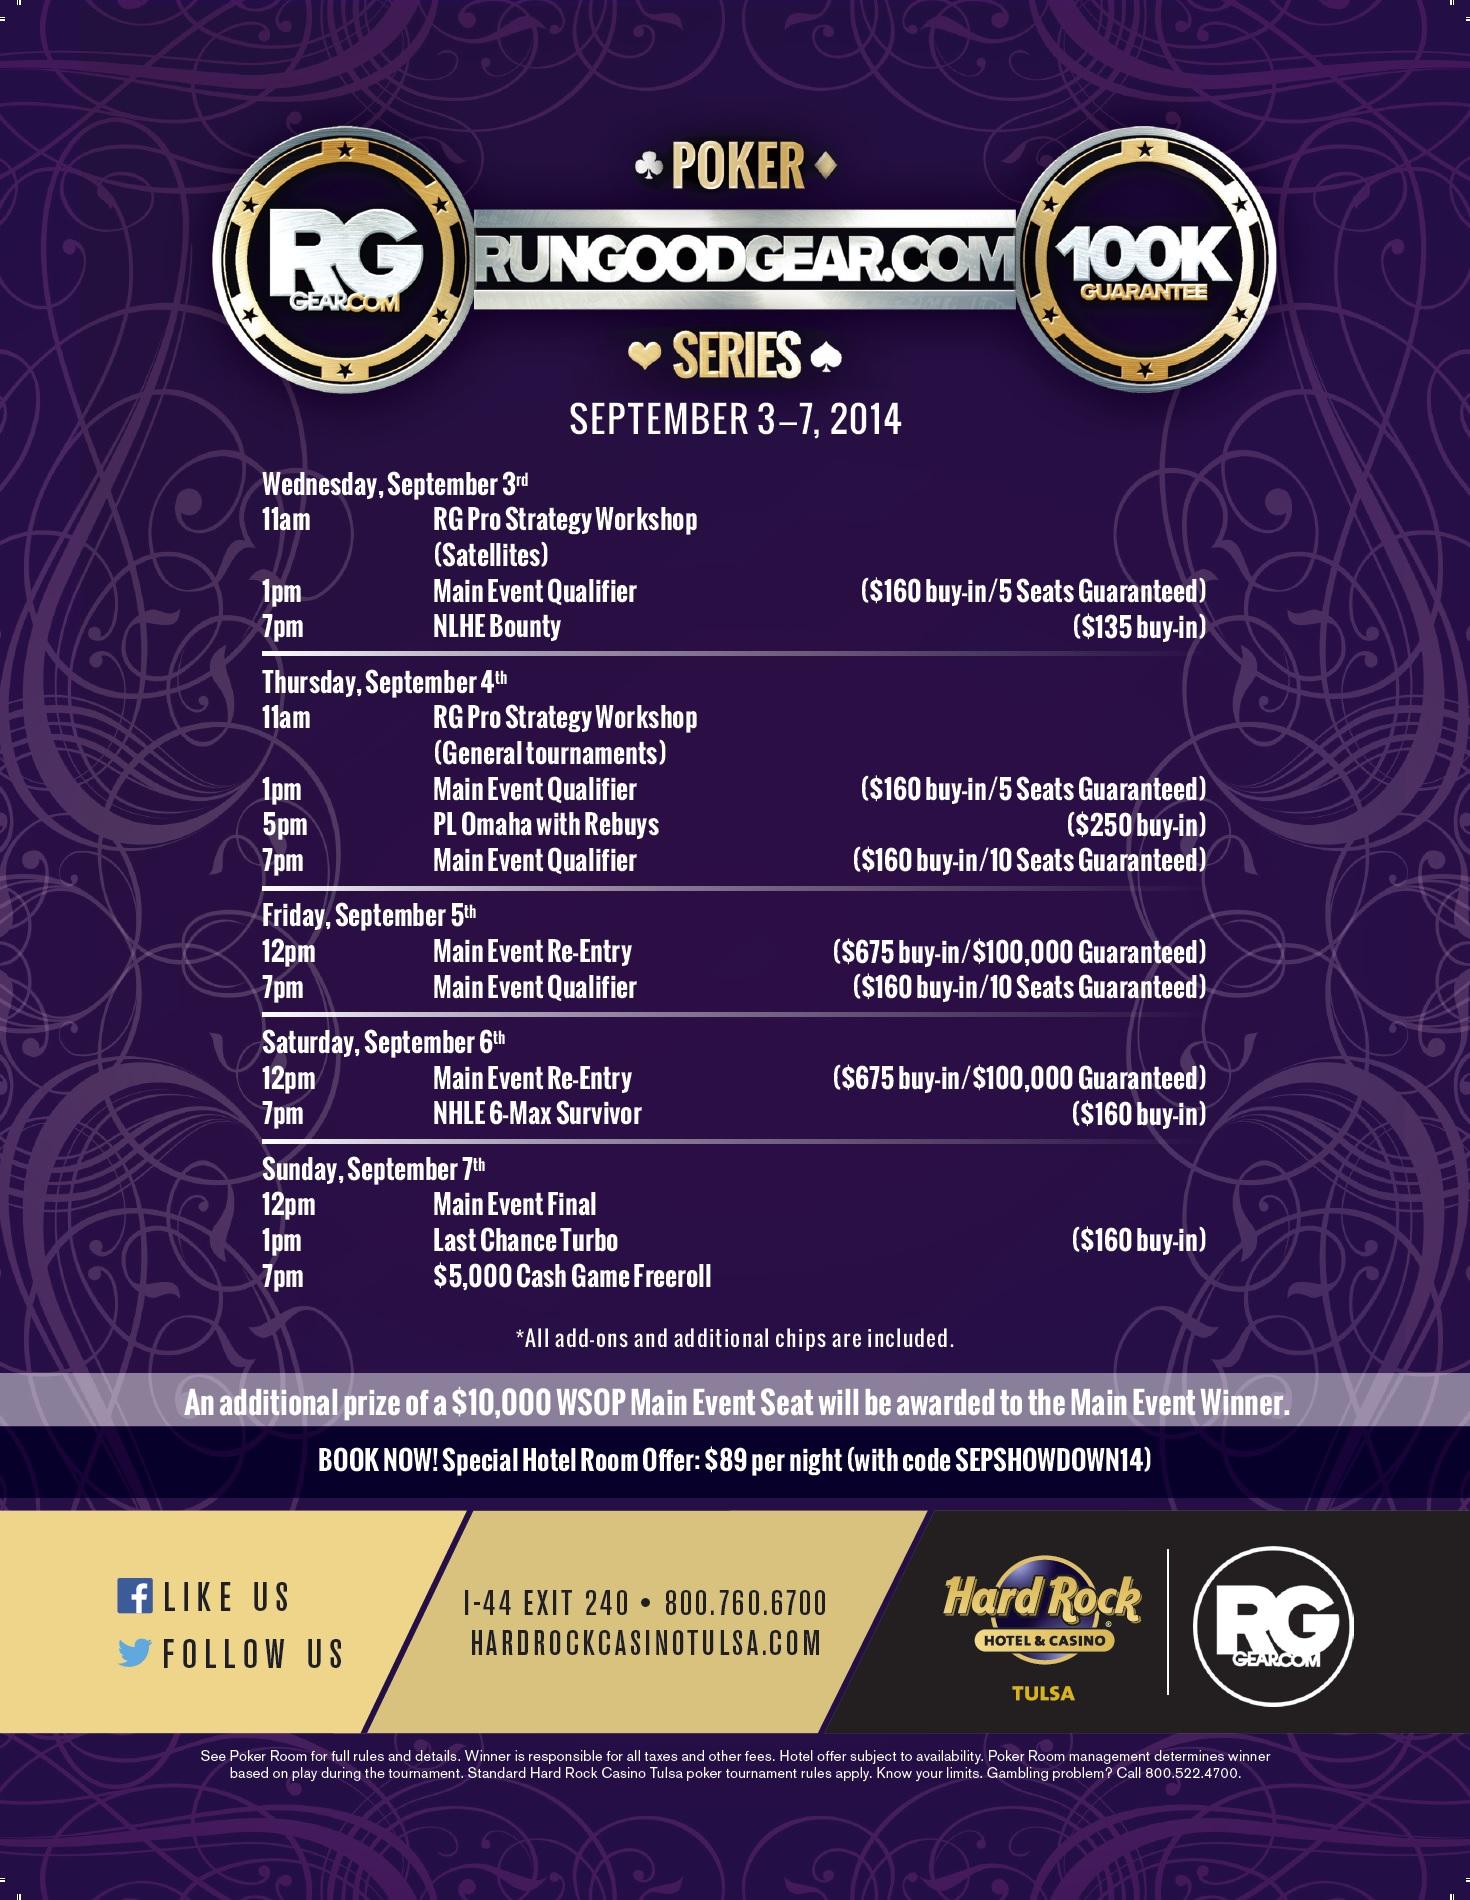 Don't Miss the RunGoodGear.com Poker Series at Hard Rock Tulsa Sept. 3-7! 101